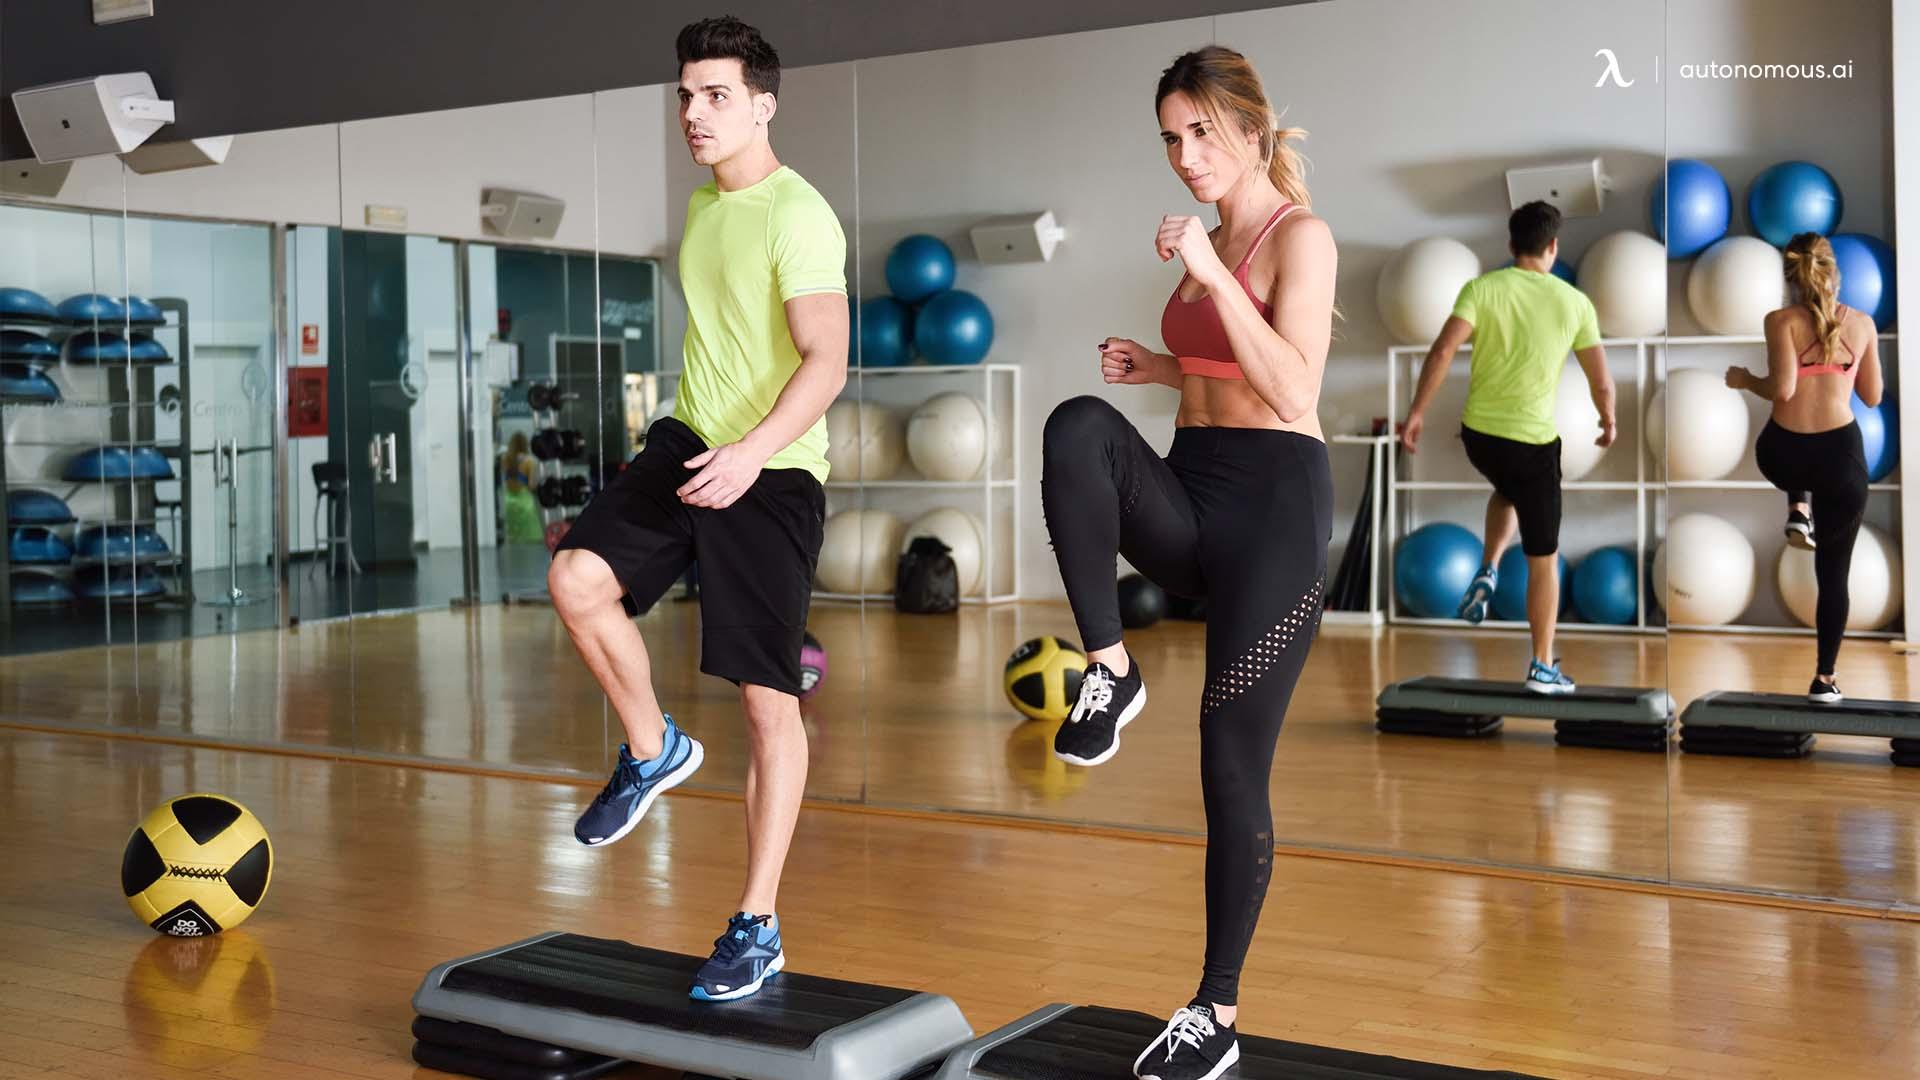 Cardiovascular exercises